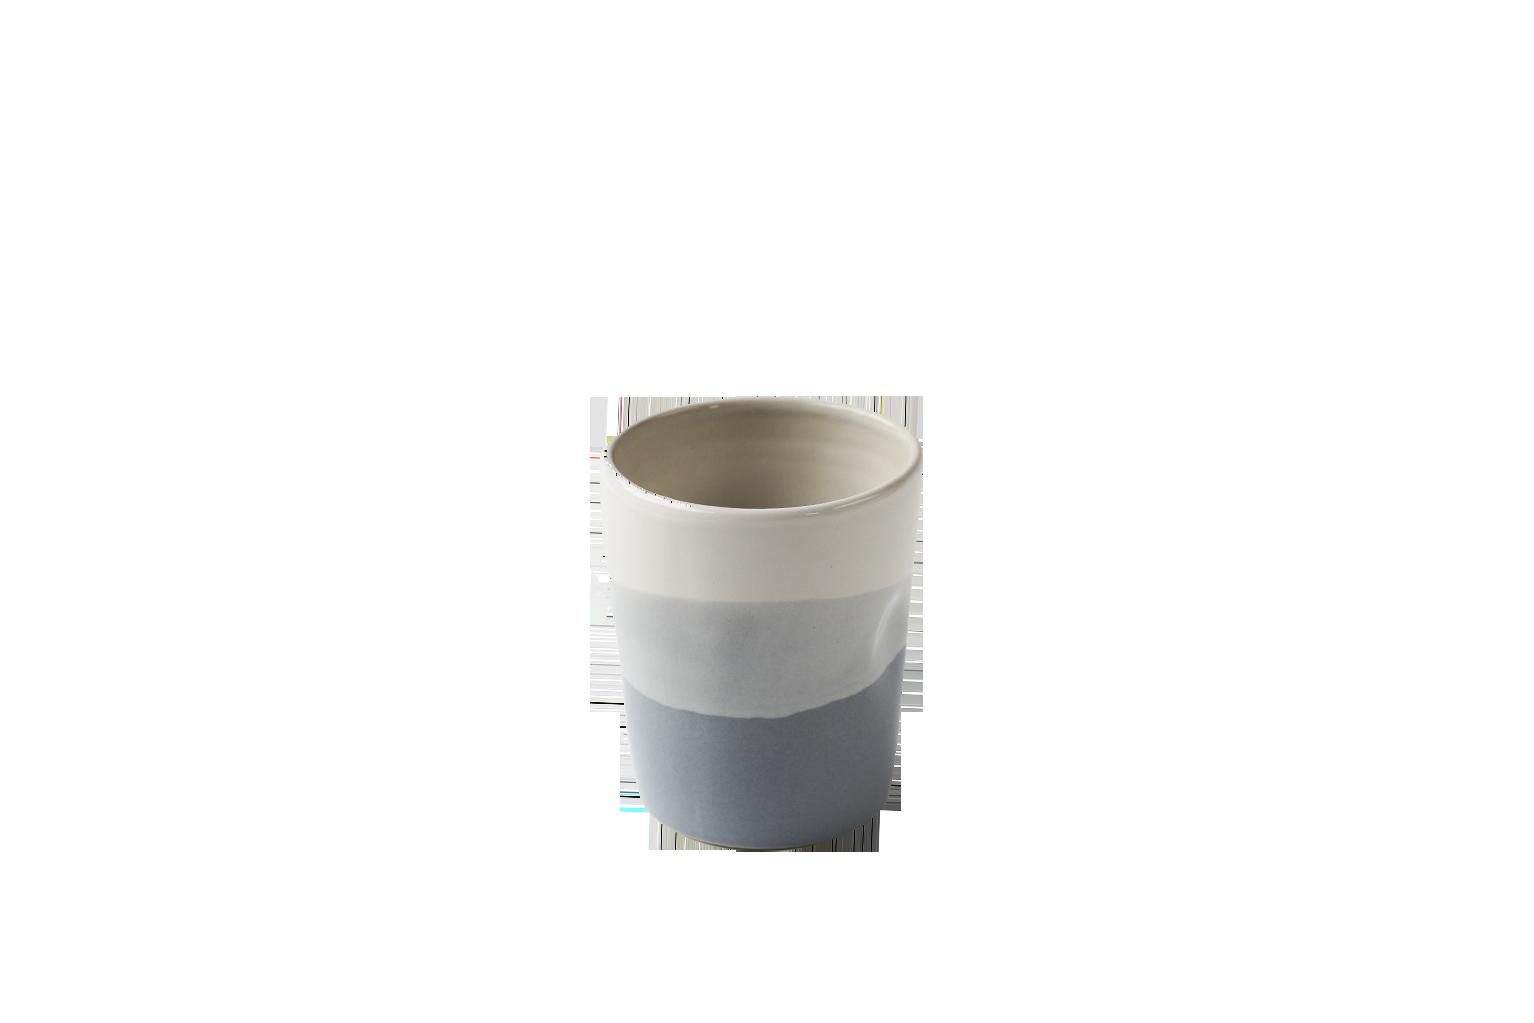 Ceramic Water Glasses - S$35